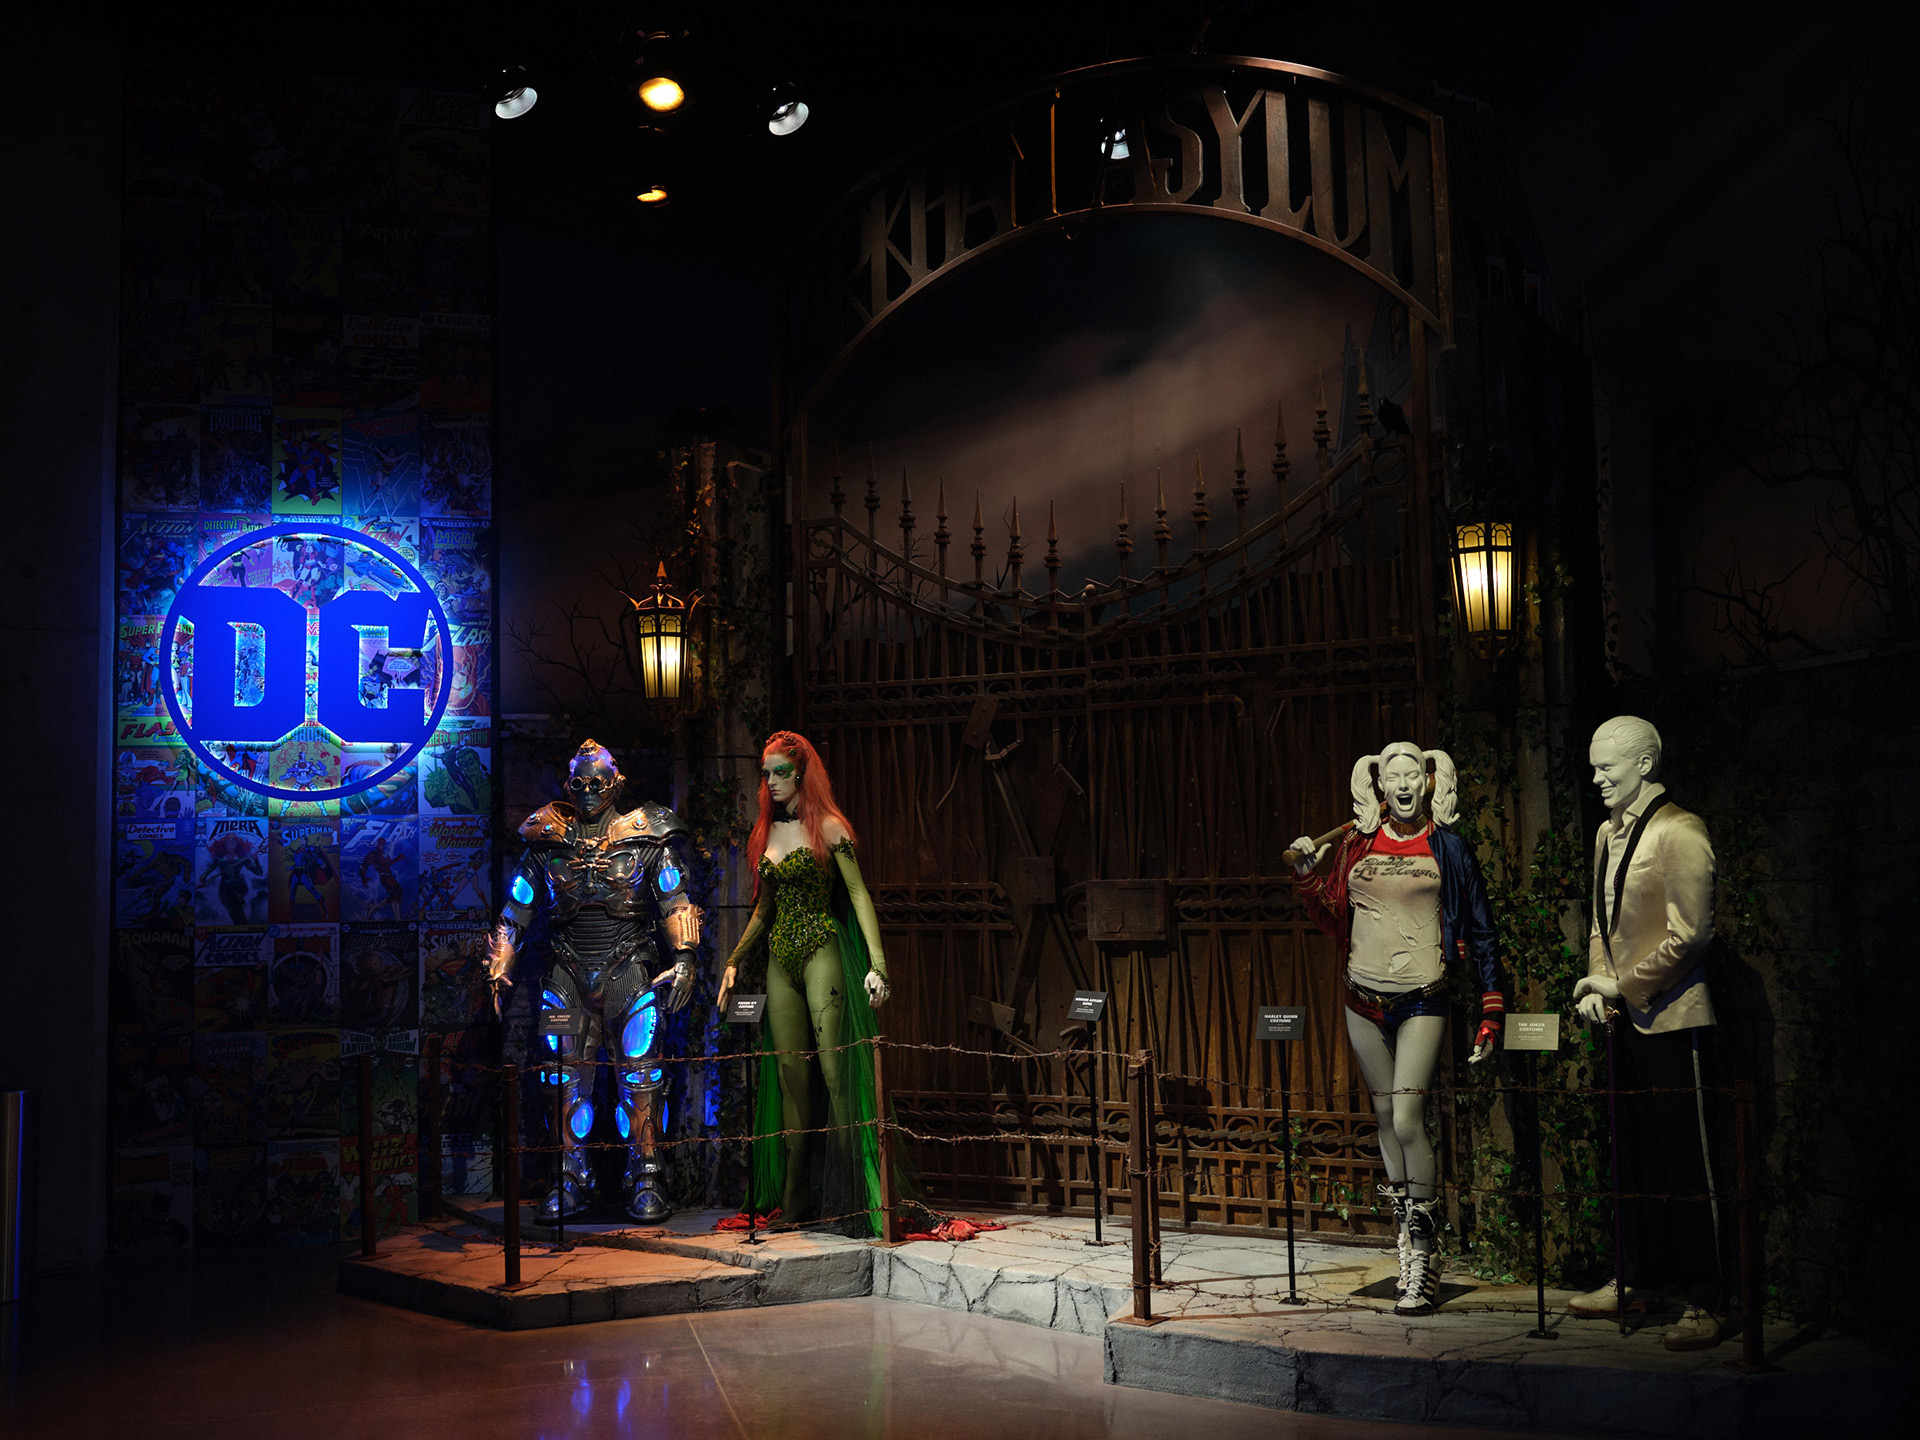 a-local-tour-through-entertainment-history-8-dc-comics-costumes-mr-freeze-poison-ivy-harley-quinn-joker